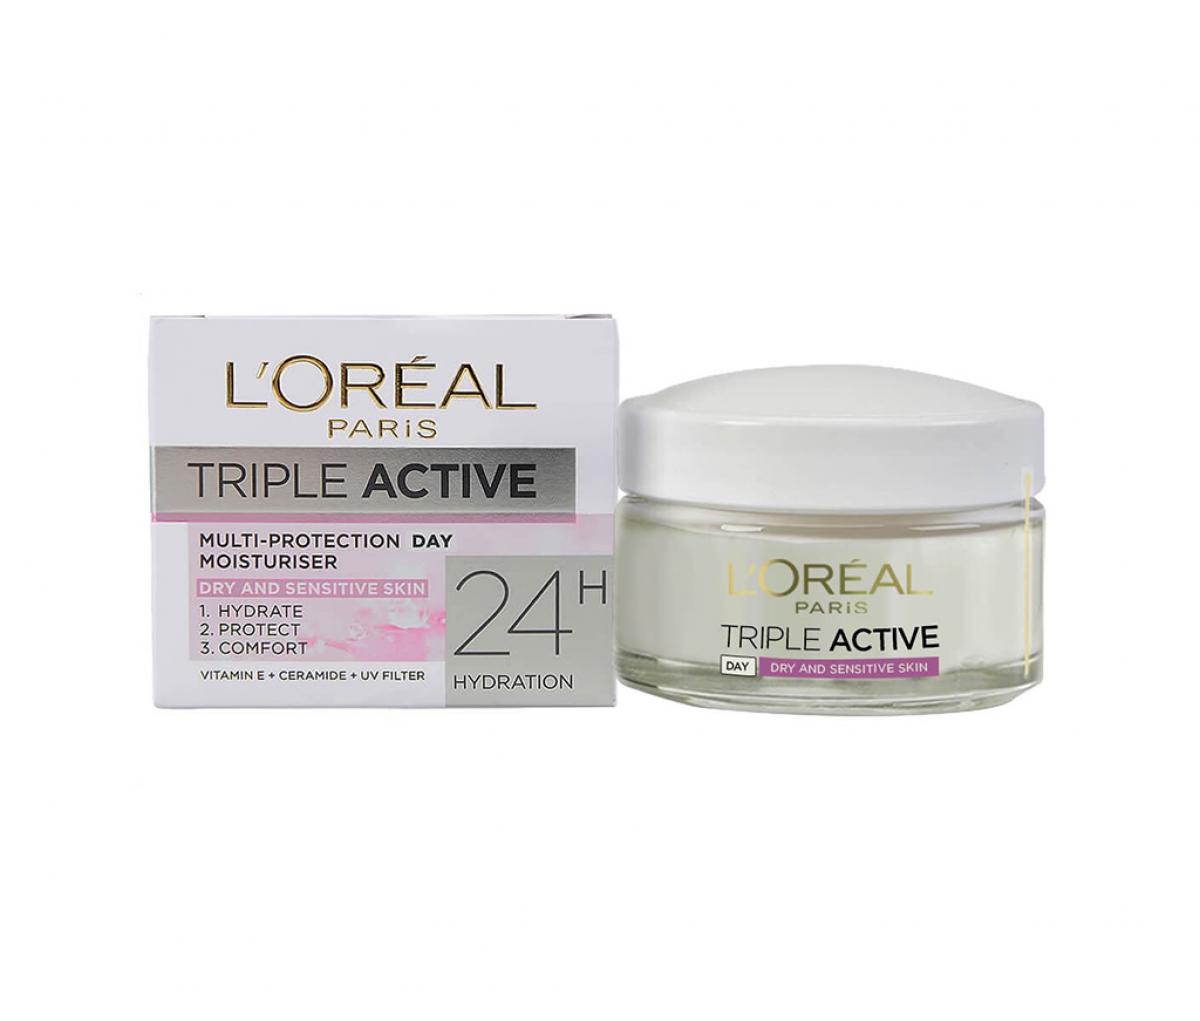 L'Oreal  Triple Active Dry & Sensitive Day Cream